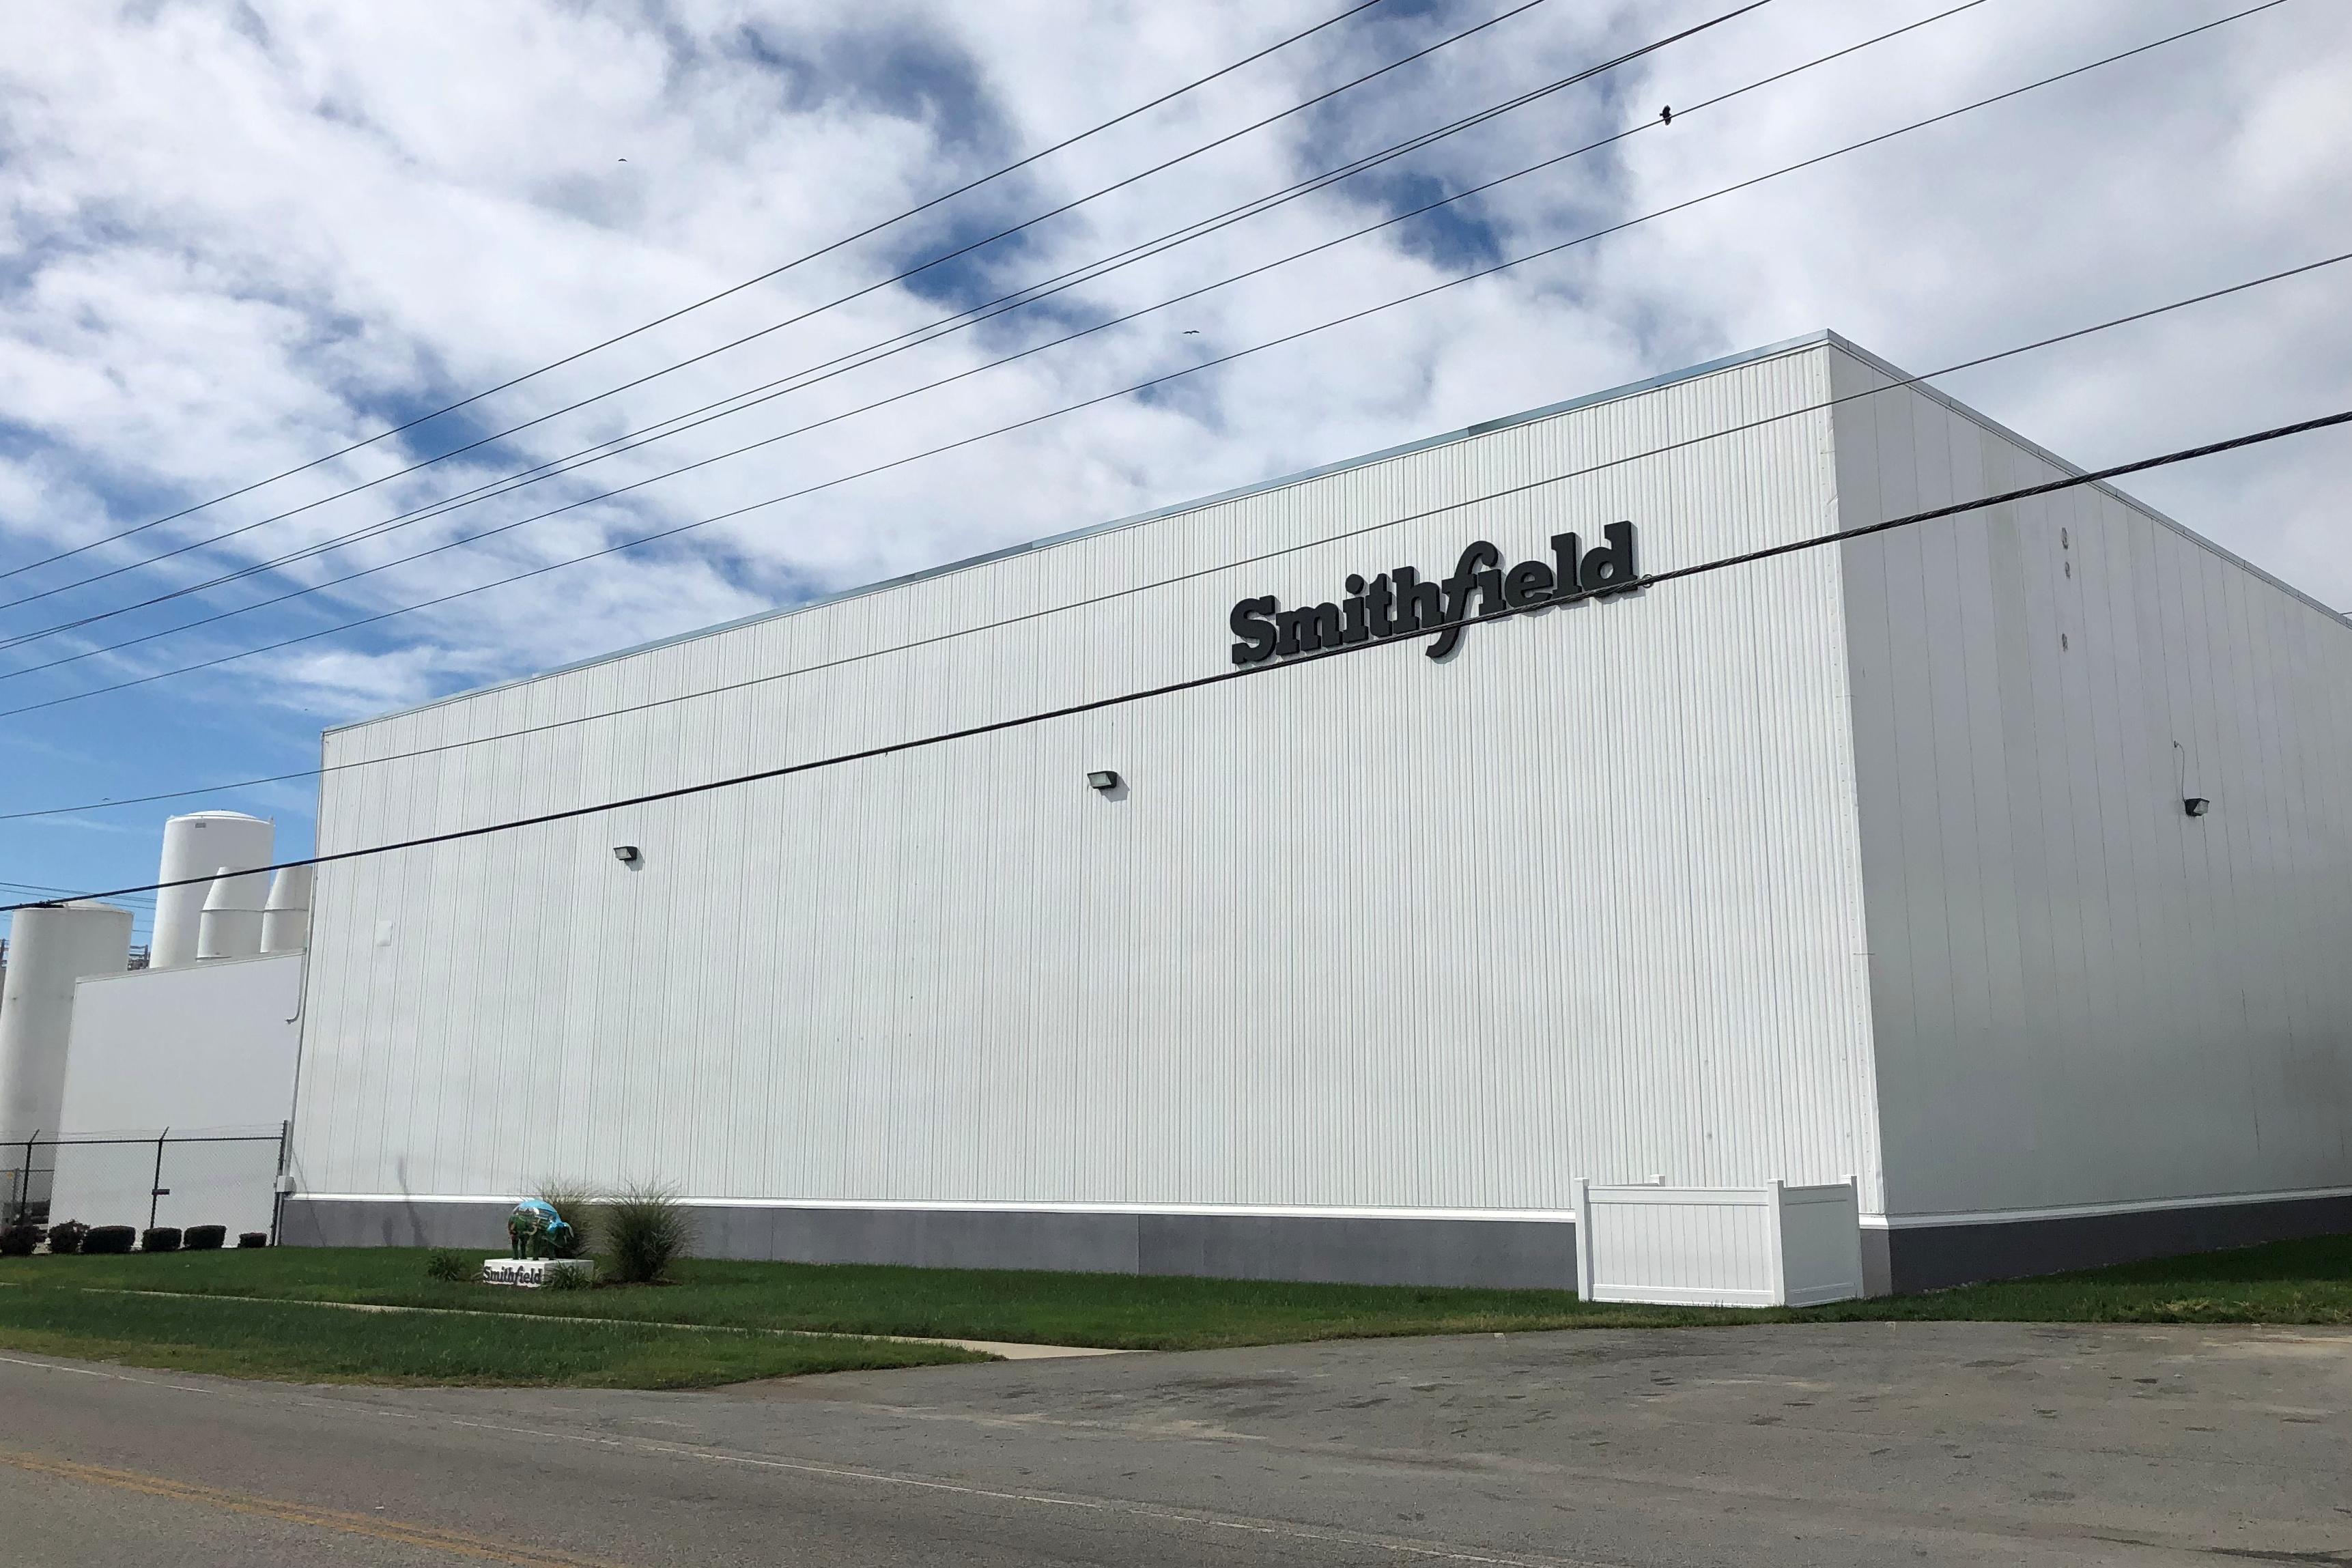 Smithfield Foods' hog slaughterhouse is seen in Smithfield, Virginia, U.S. October 17, 2019. REUTERS/Tom Polansek